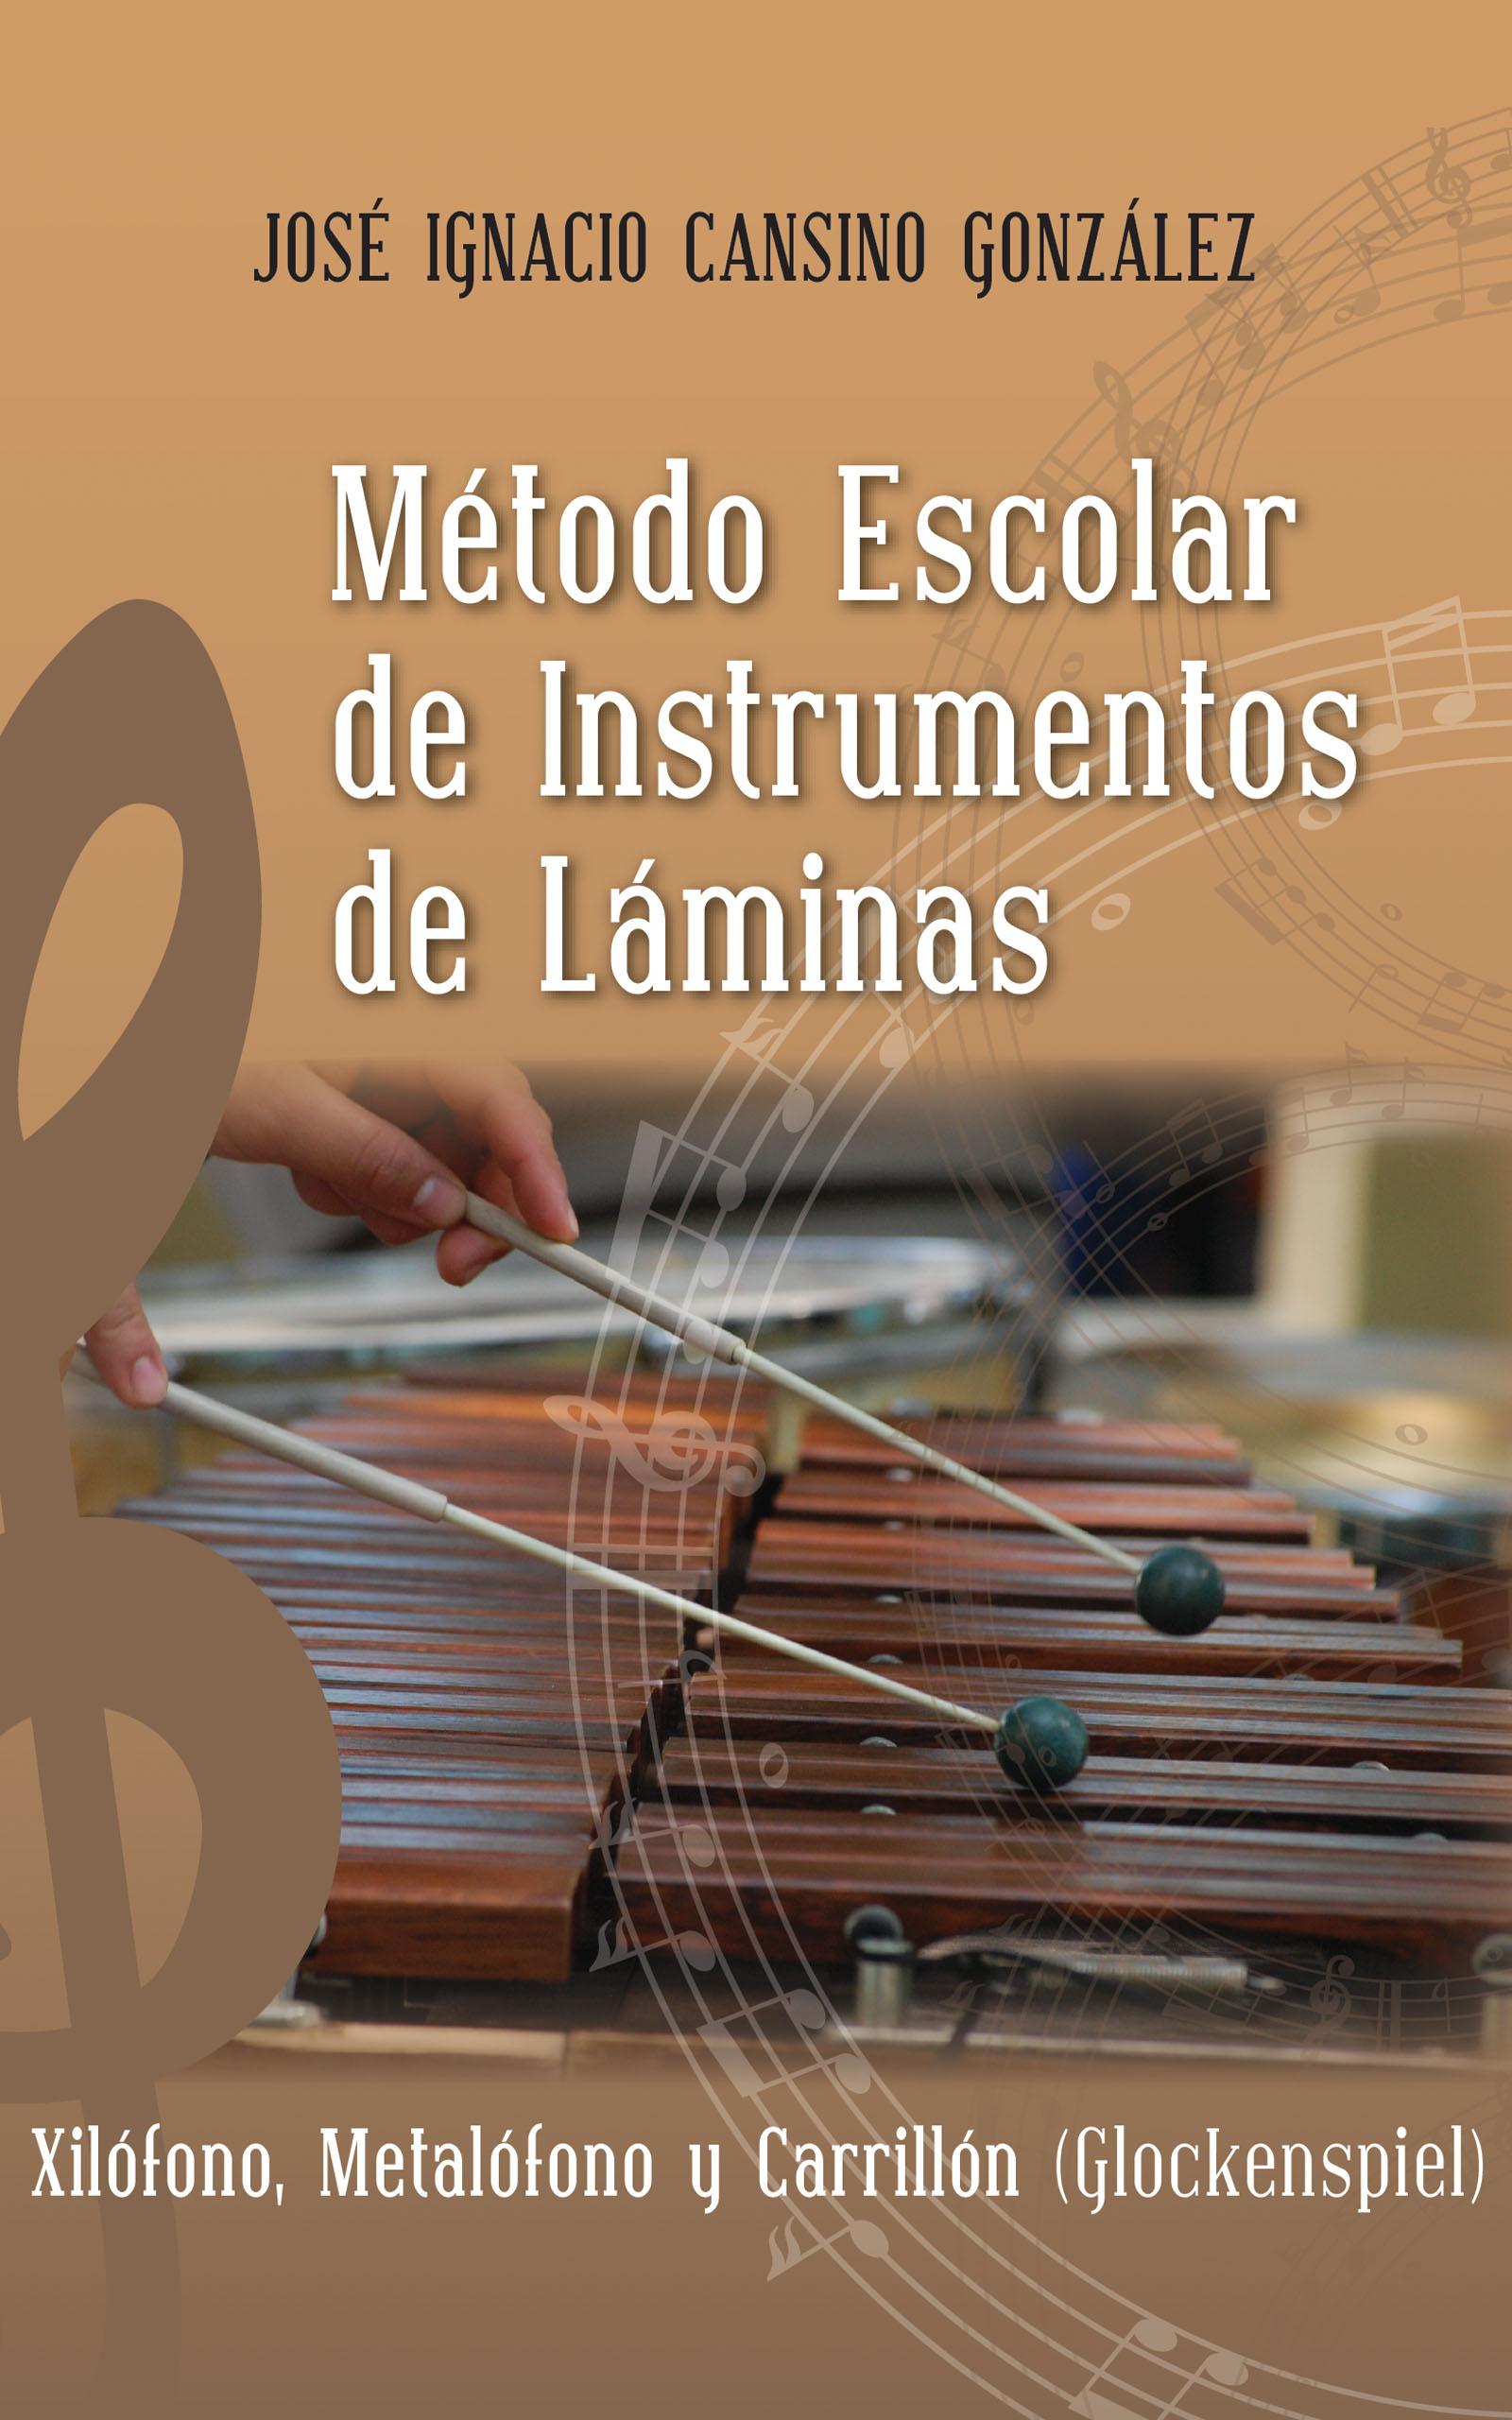 Método Escolar de Instrumentos de Láminas, de José Ignacio Cansino González